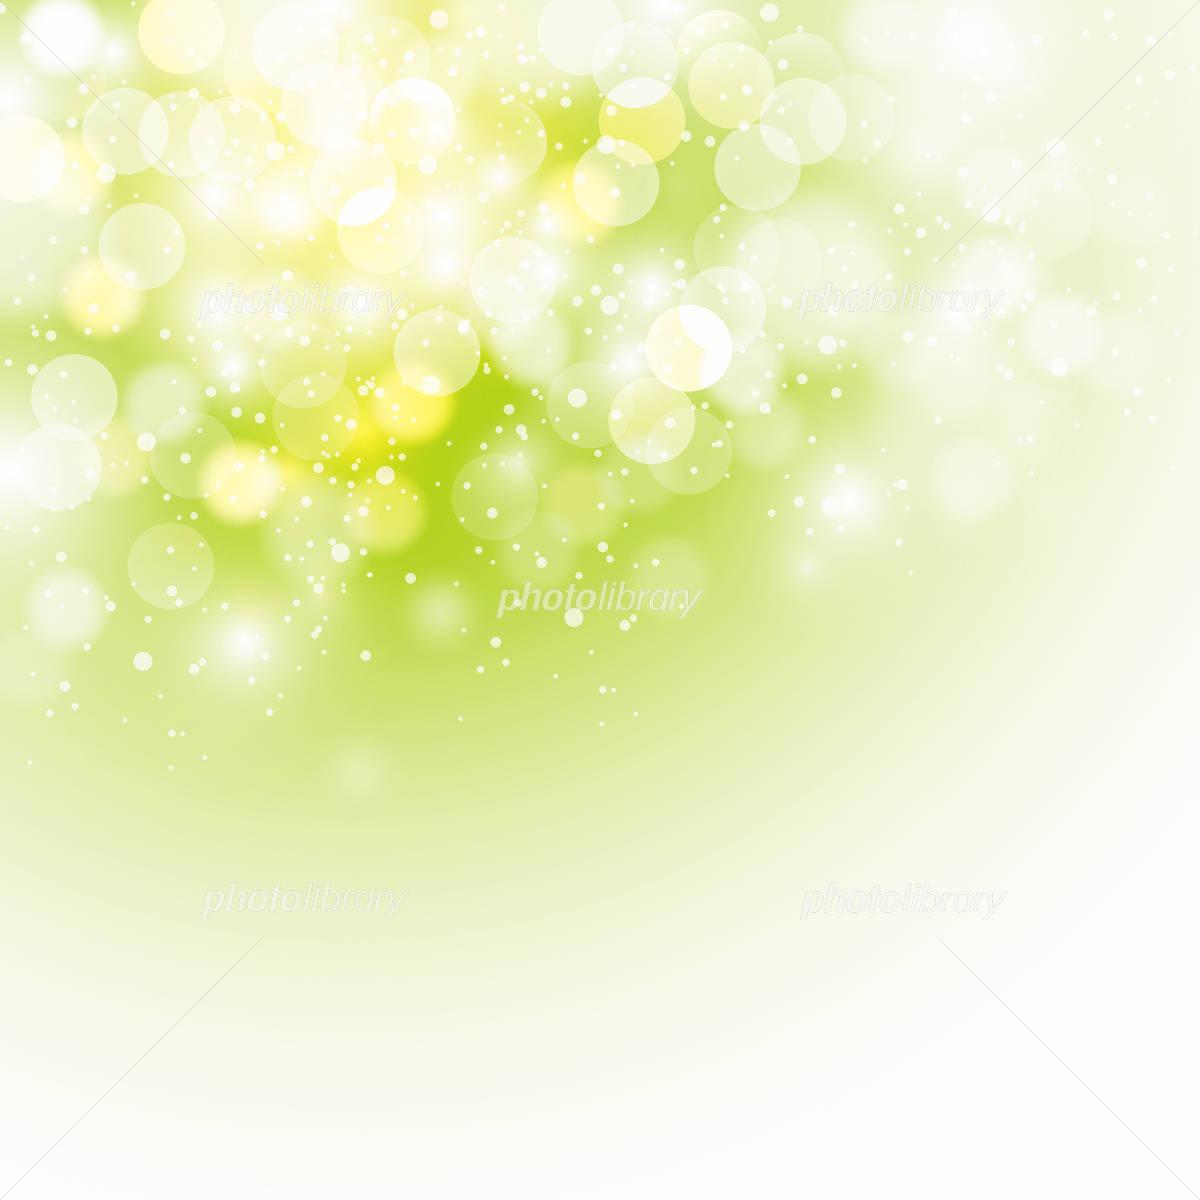 Glitter background イラスト素材